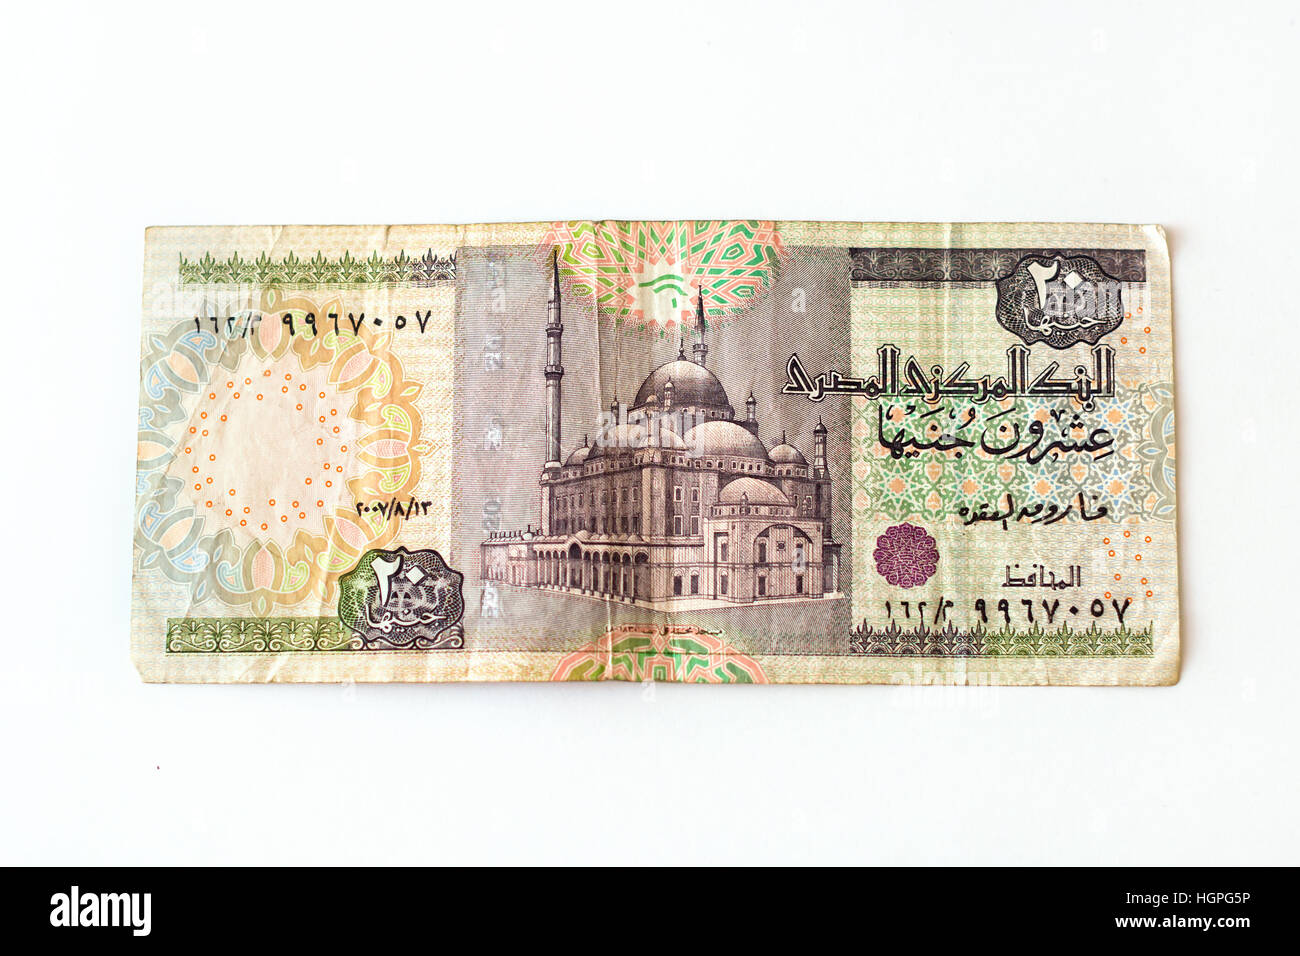 20 Egyptian Pounds Old Banknote Denominations Of Twenty Egp Symbol